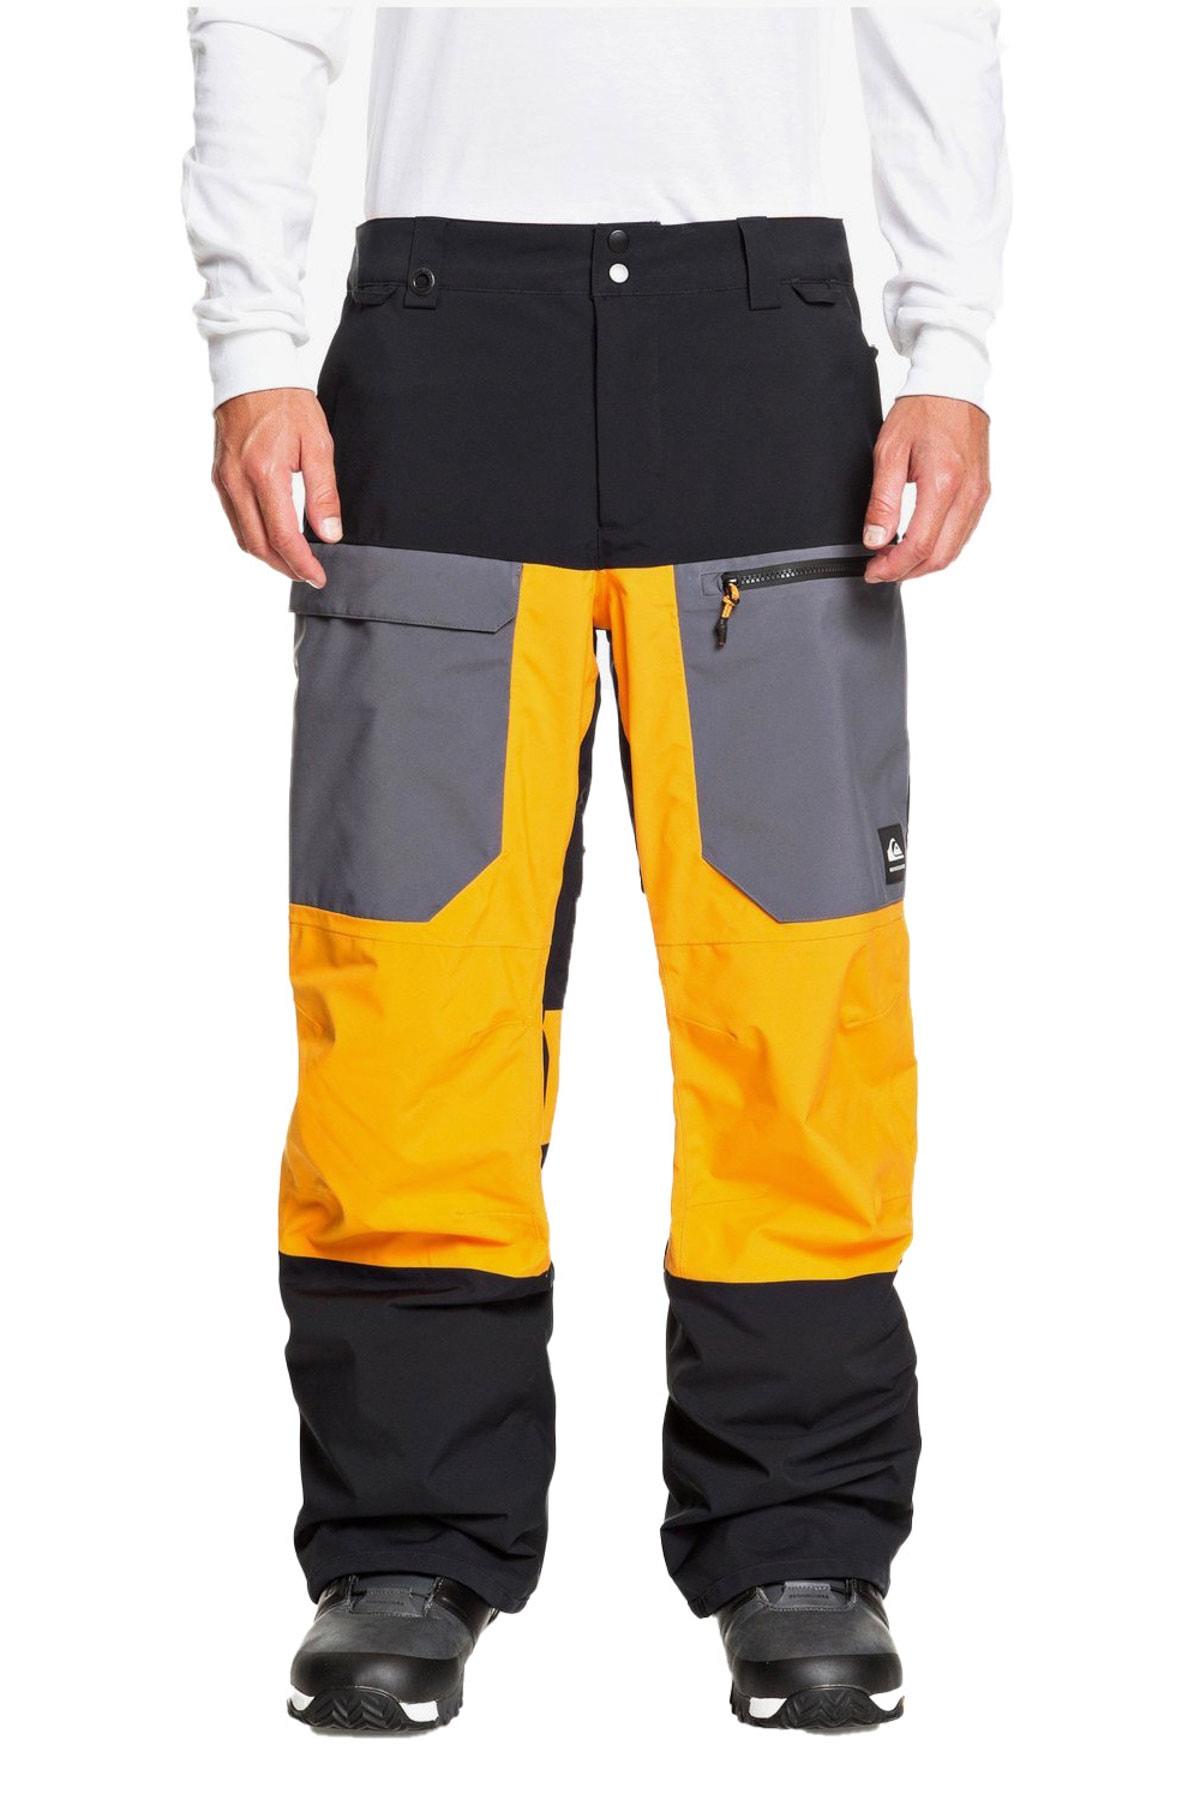 Quiksilver Tr Stretch Erkek Snowboard Pantolonu 1